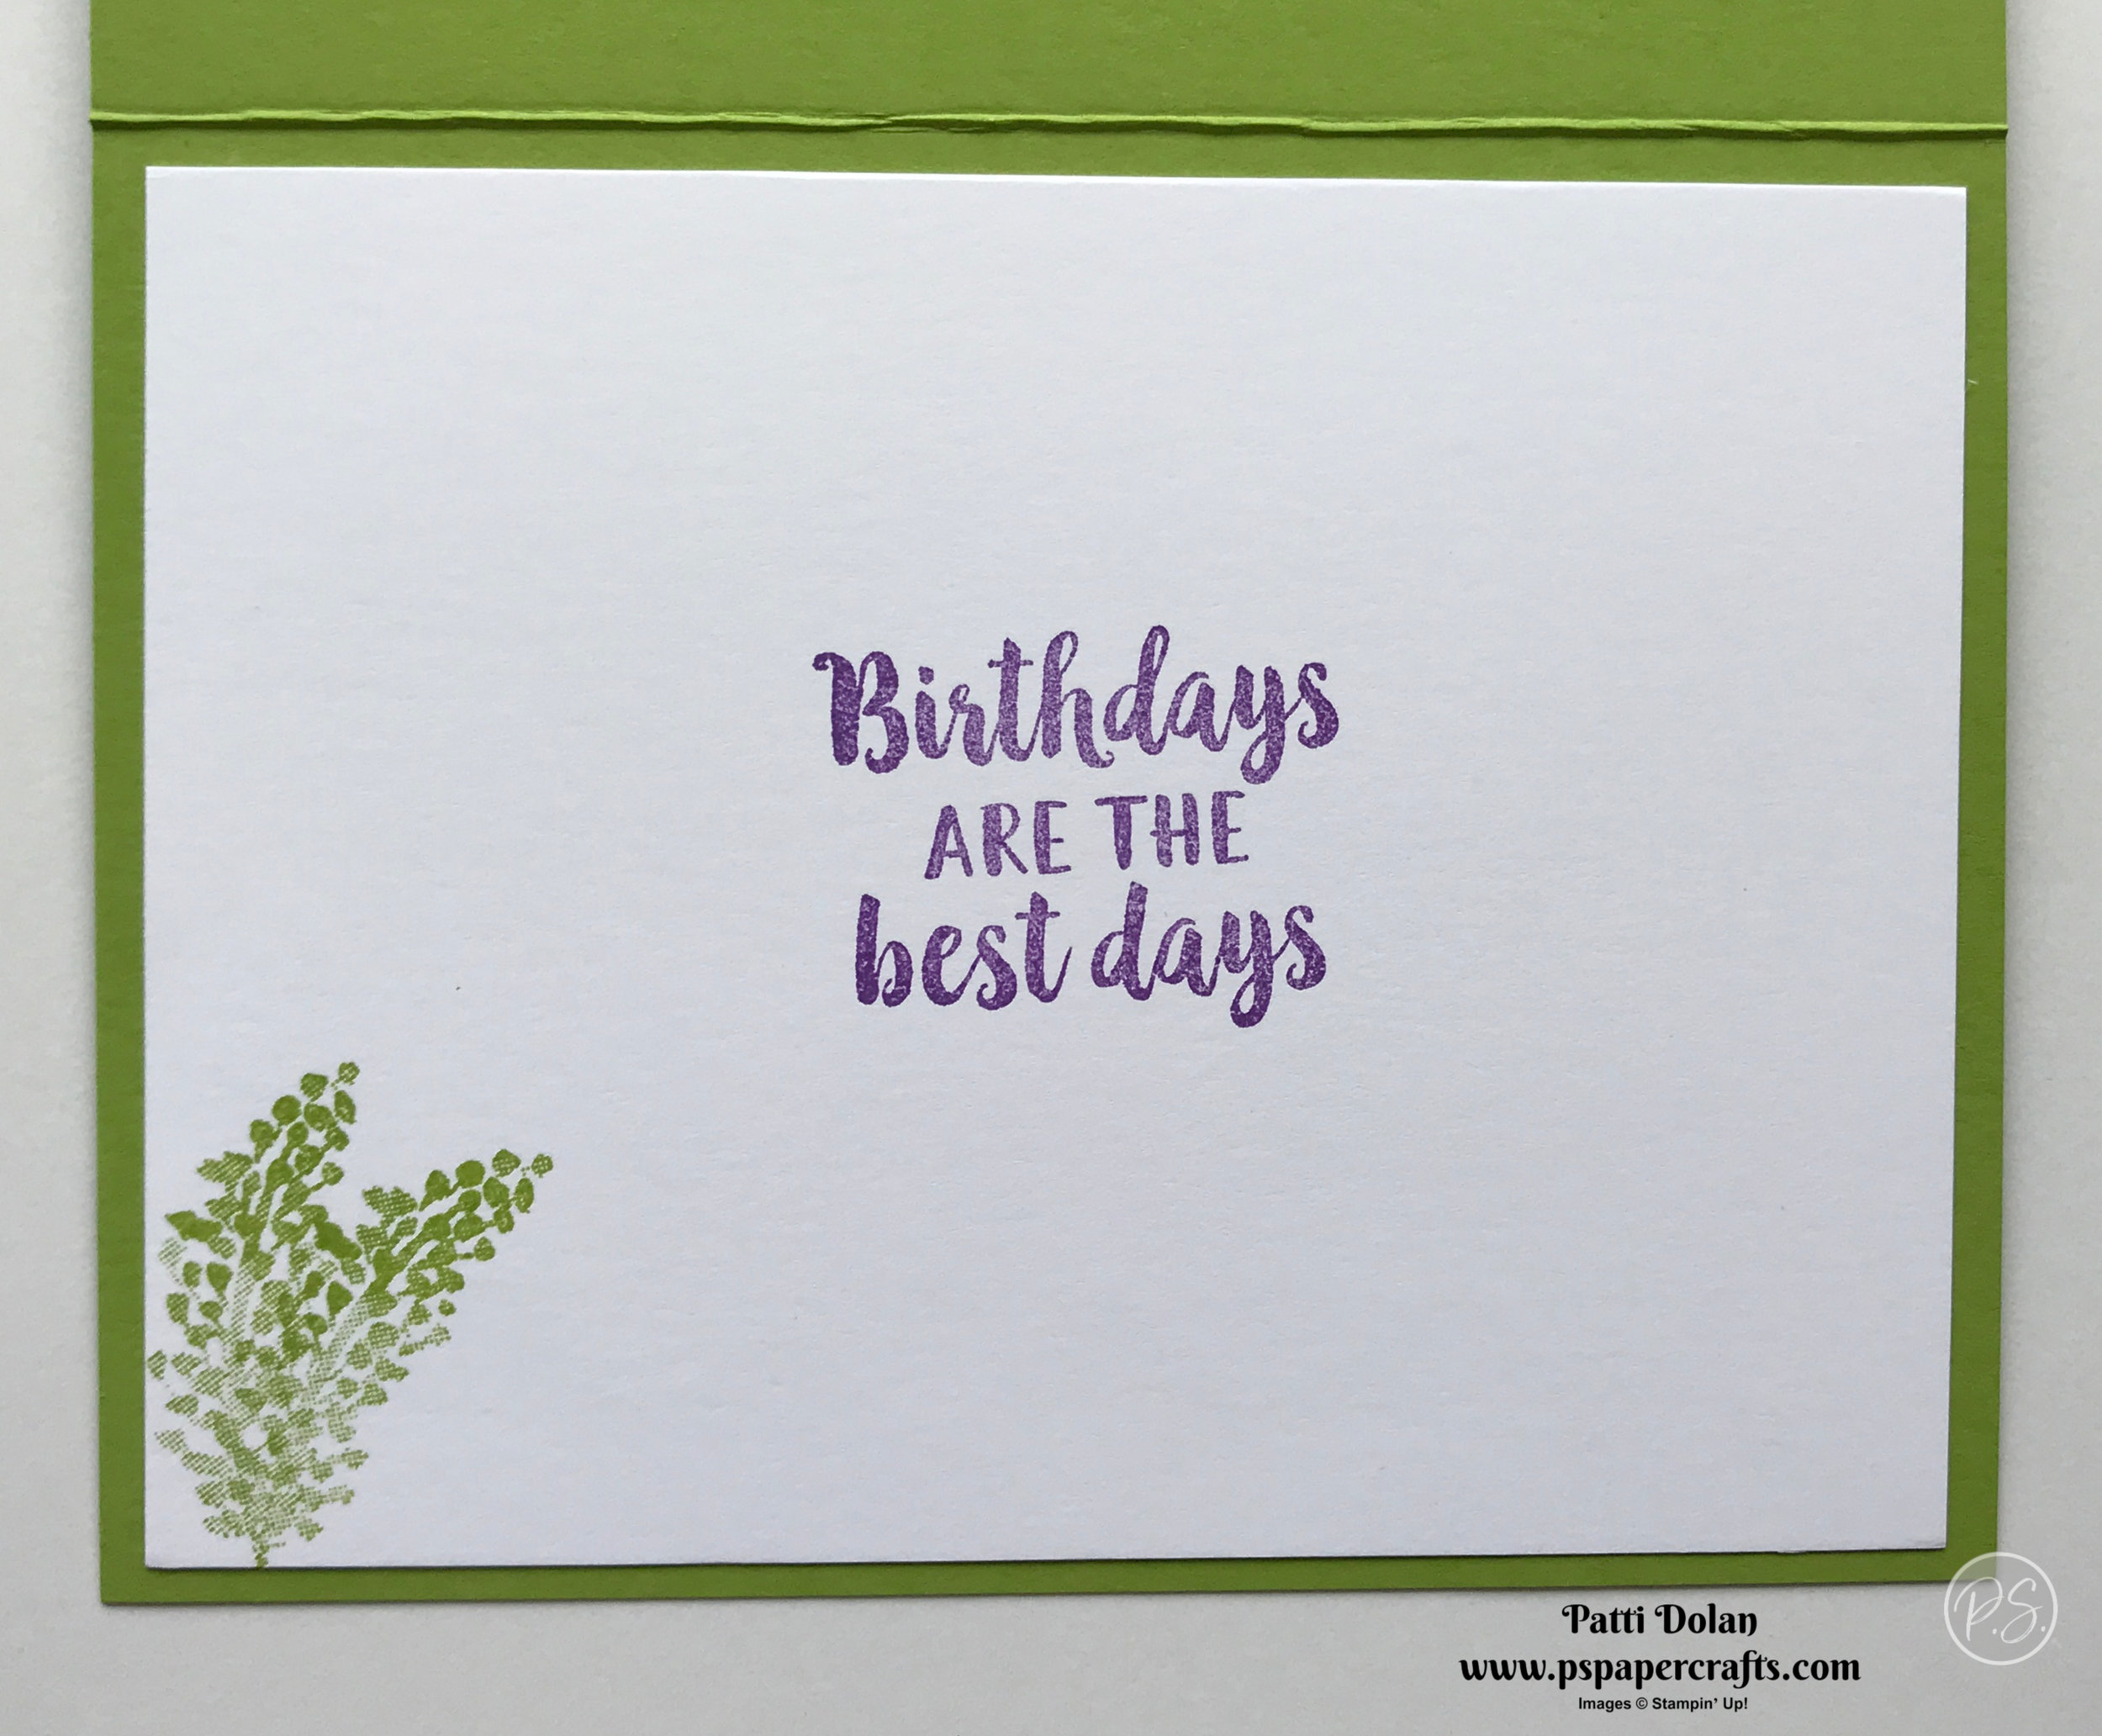 Beautiful Friendship Birthday Inside.jpg